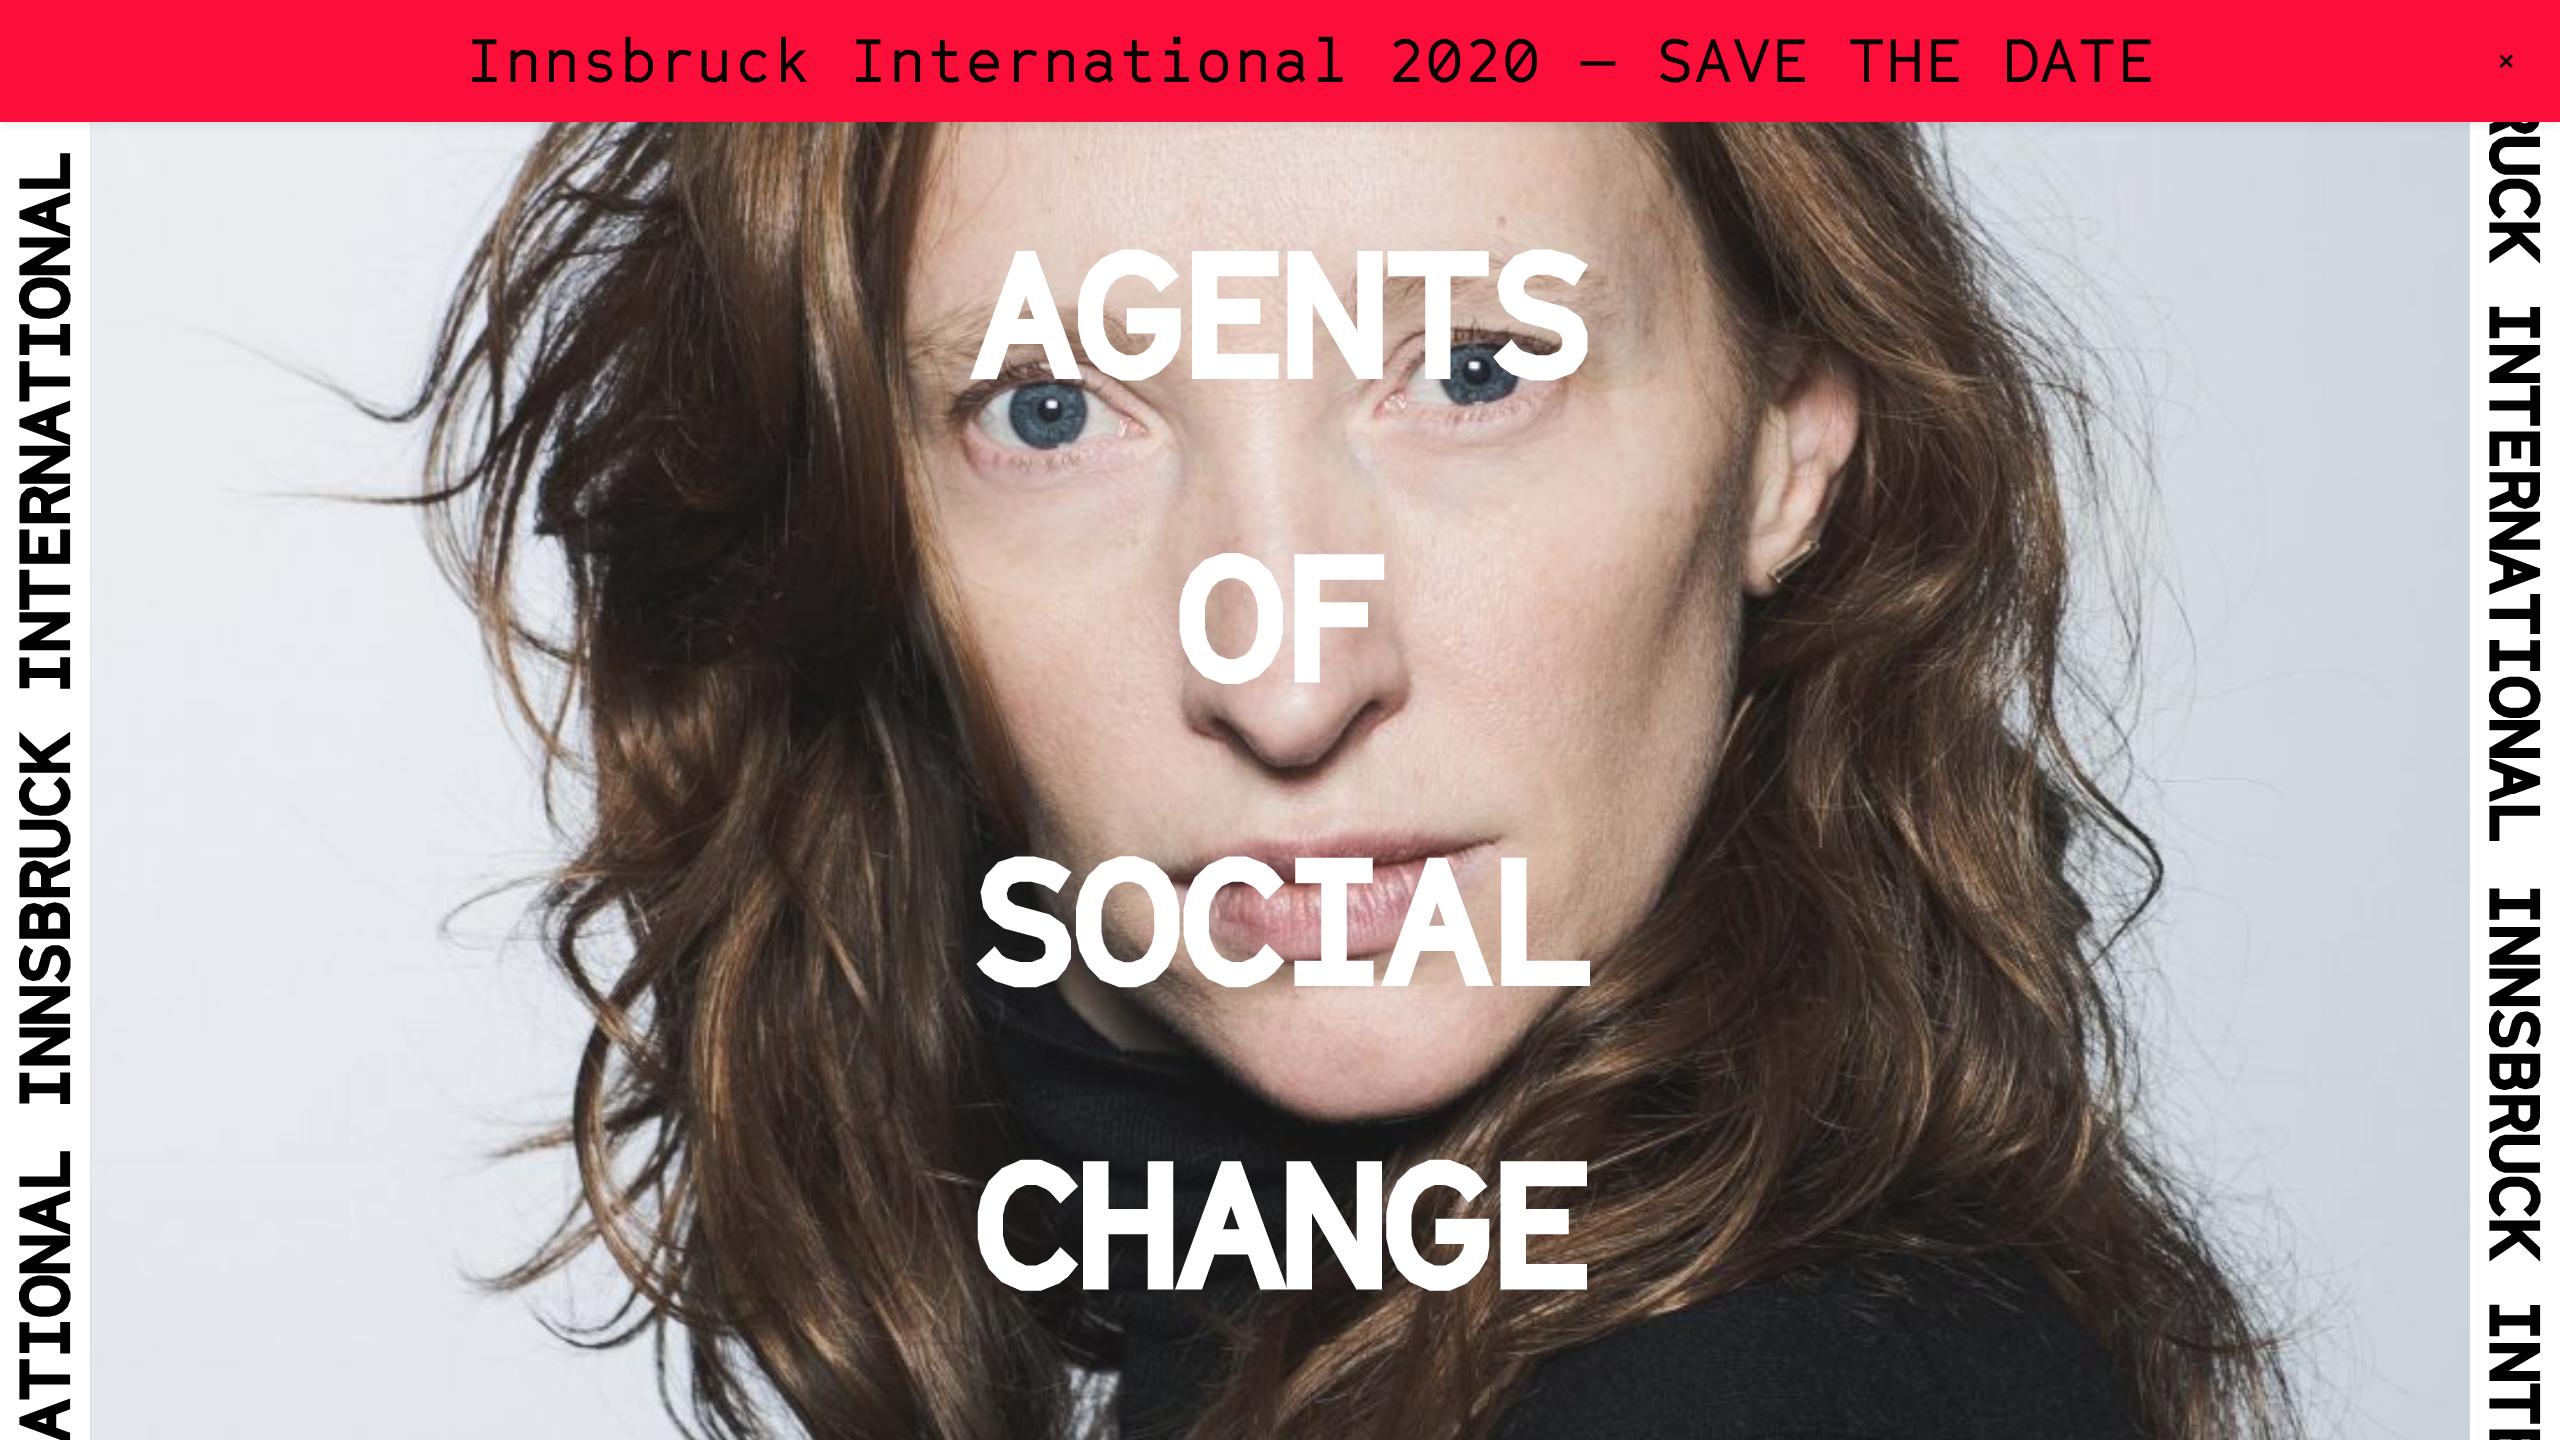 Innsbruck International website design